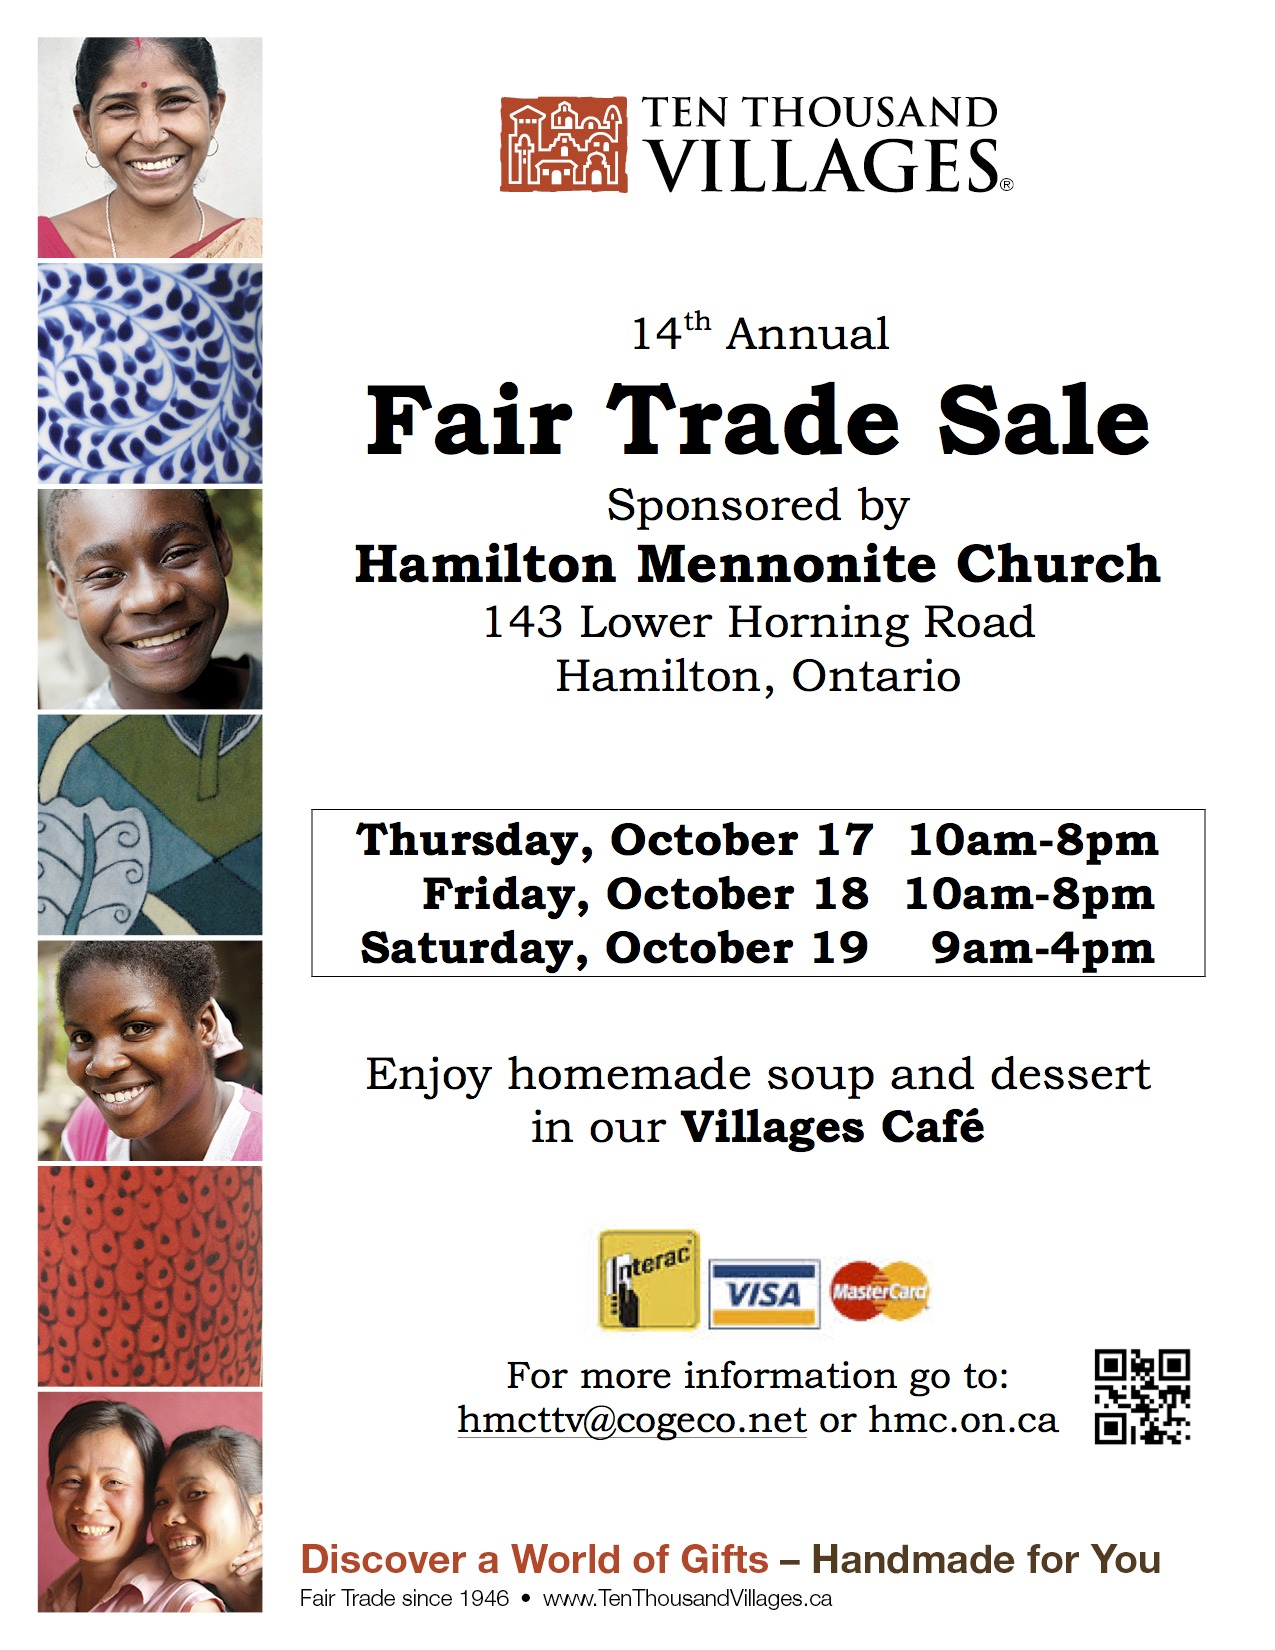 Ten Thousand Villages Fair Trade Sale | A W W C A